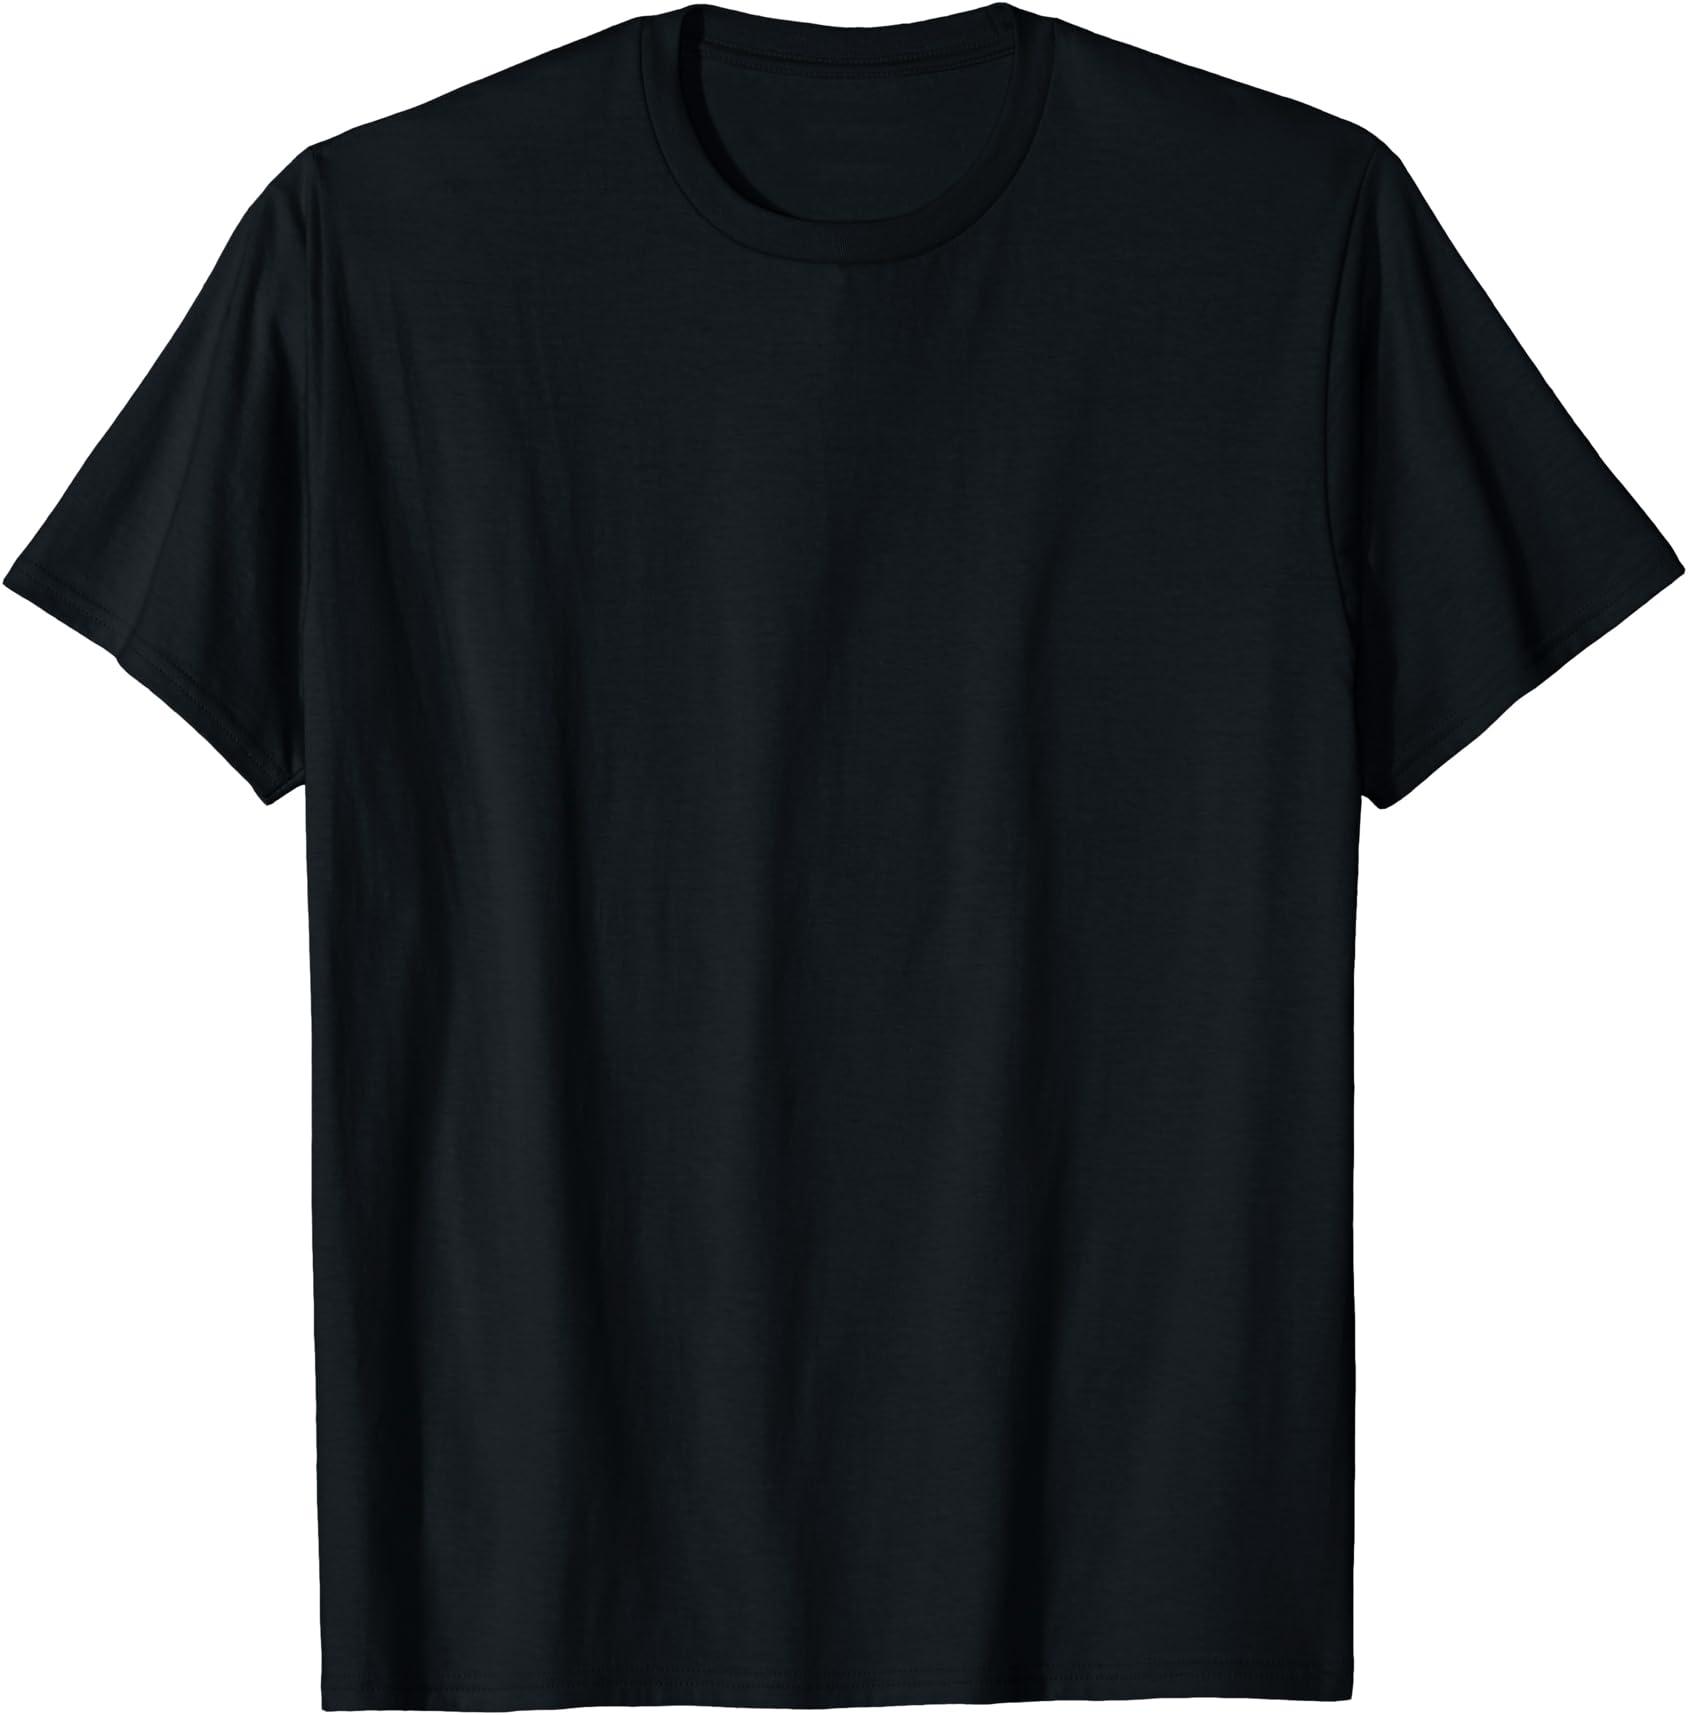 Clothing Tee Shirt Poppop Who Rides A Motorcycle Shirt